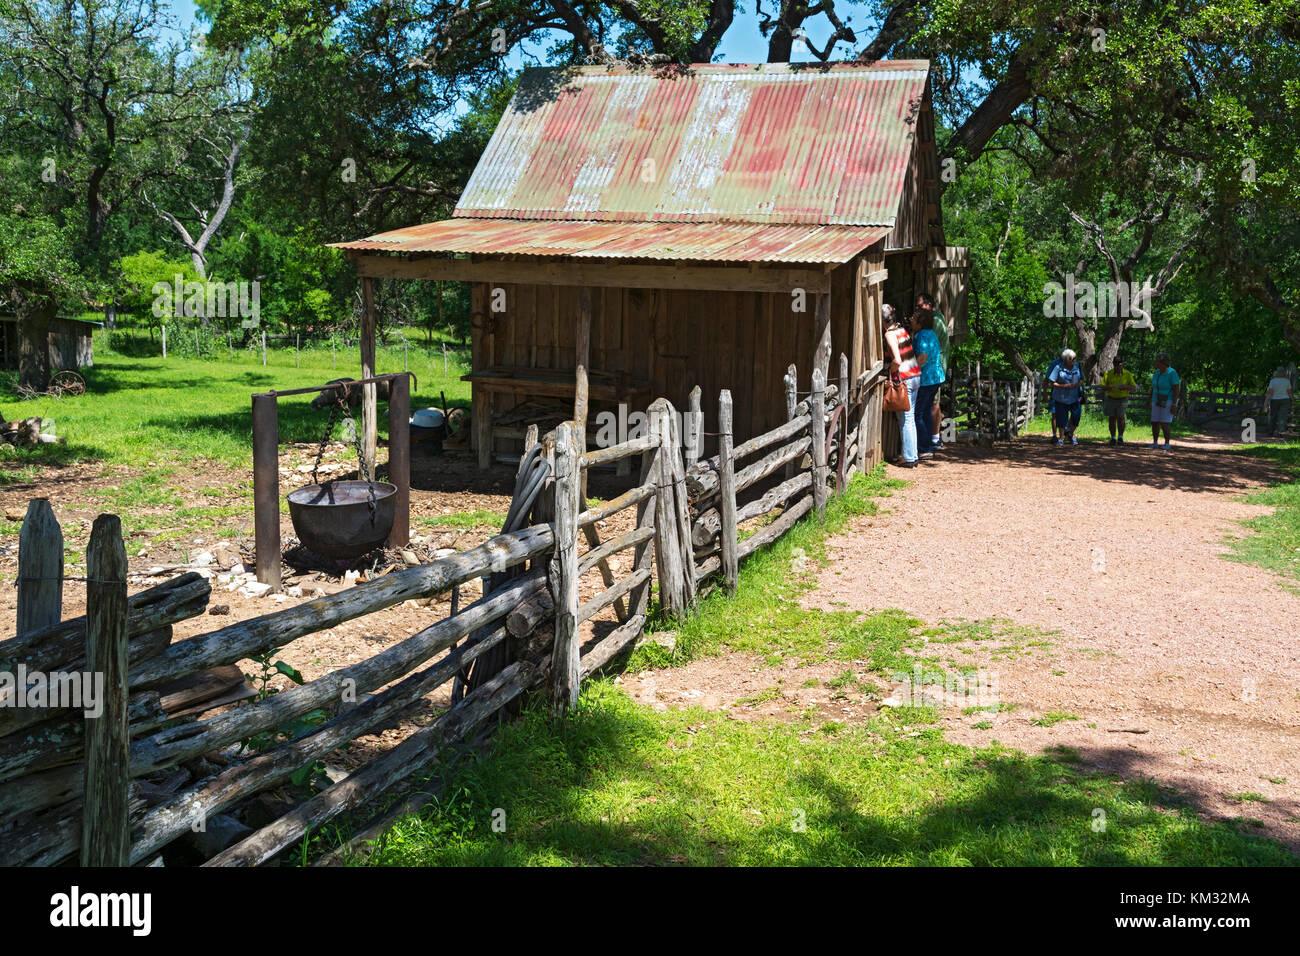 Texas, Stonewall, LBJ State Park and Historic Site, Sauer-Beckmann, Living History Farm, circa 1915-1918, barn - Stock Image